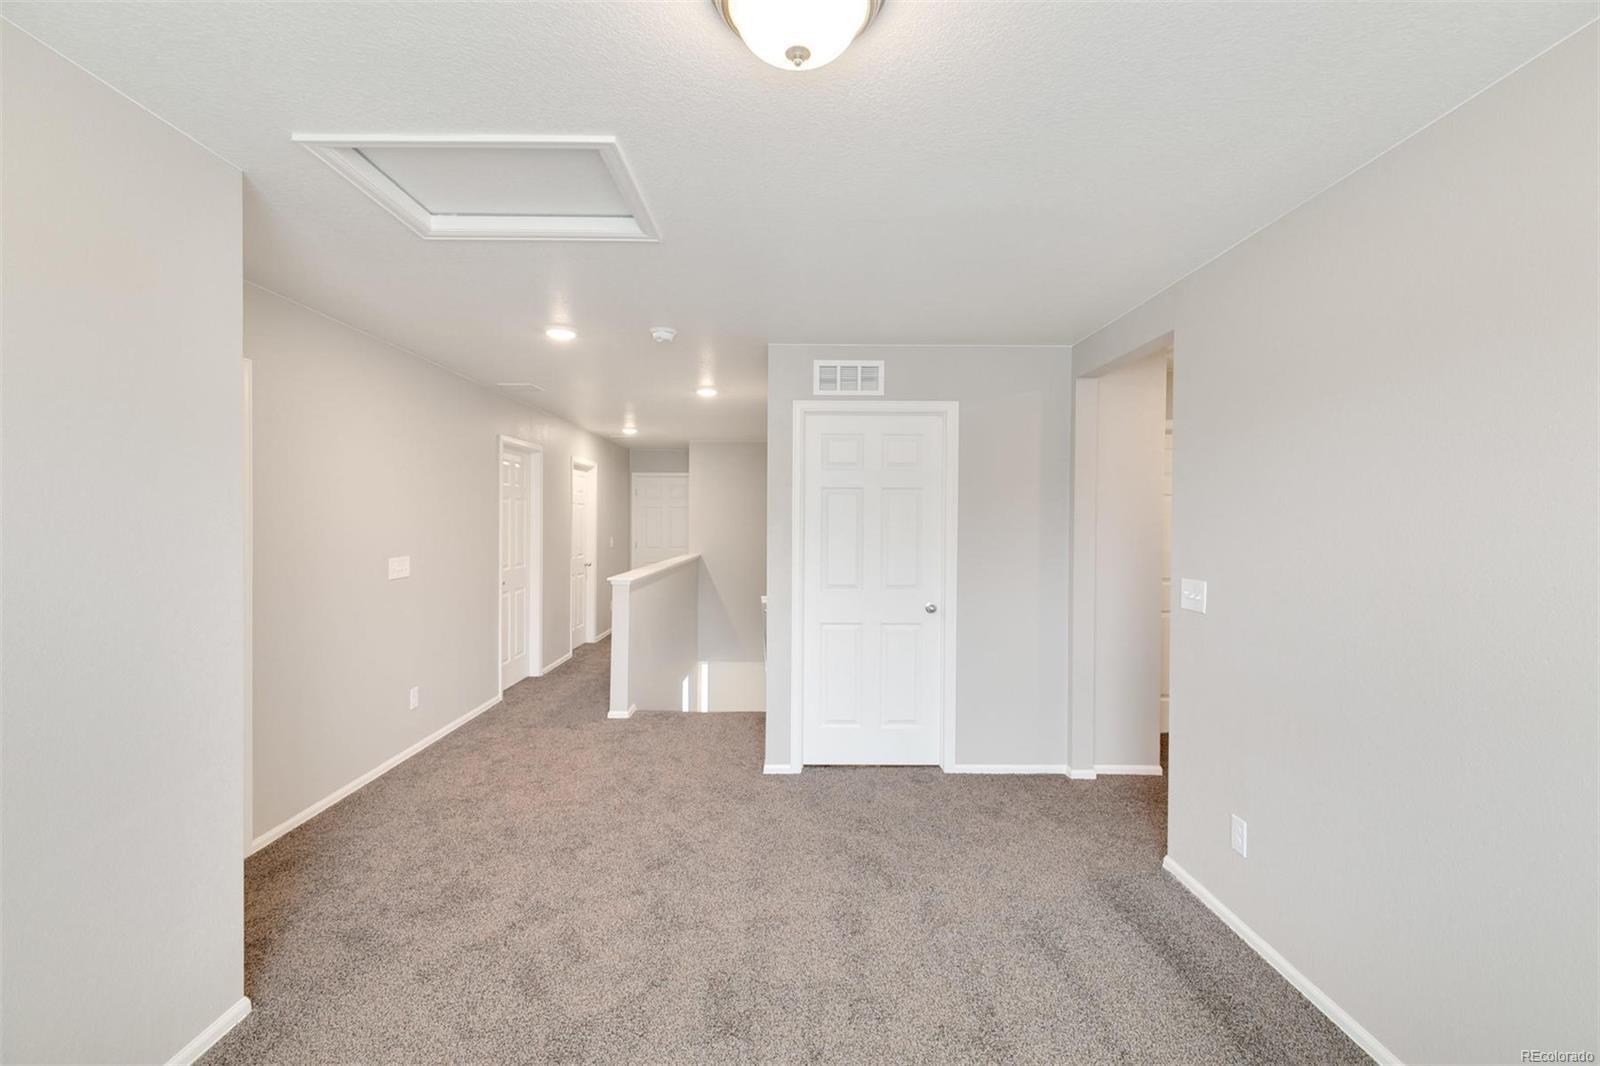 MLS# 9321198 - 9 - 6121 Yellowtail Street, Timnath, CO 80547